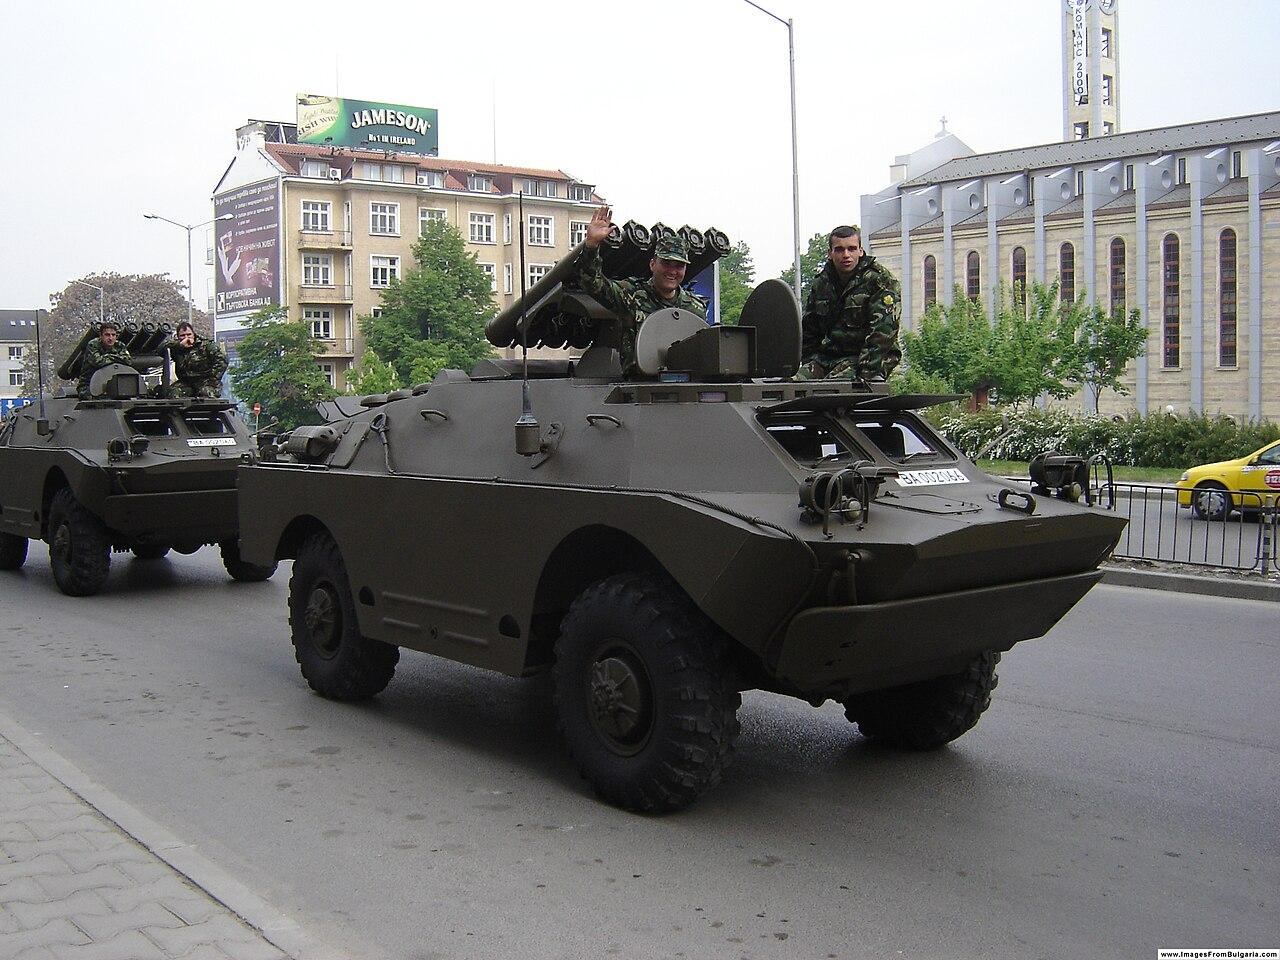 1280px-BRDM-2_Anti-tank_vehicle.jpg